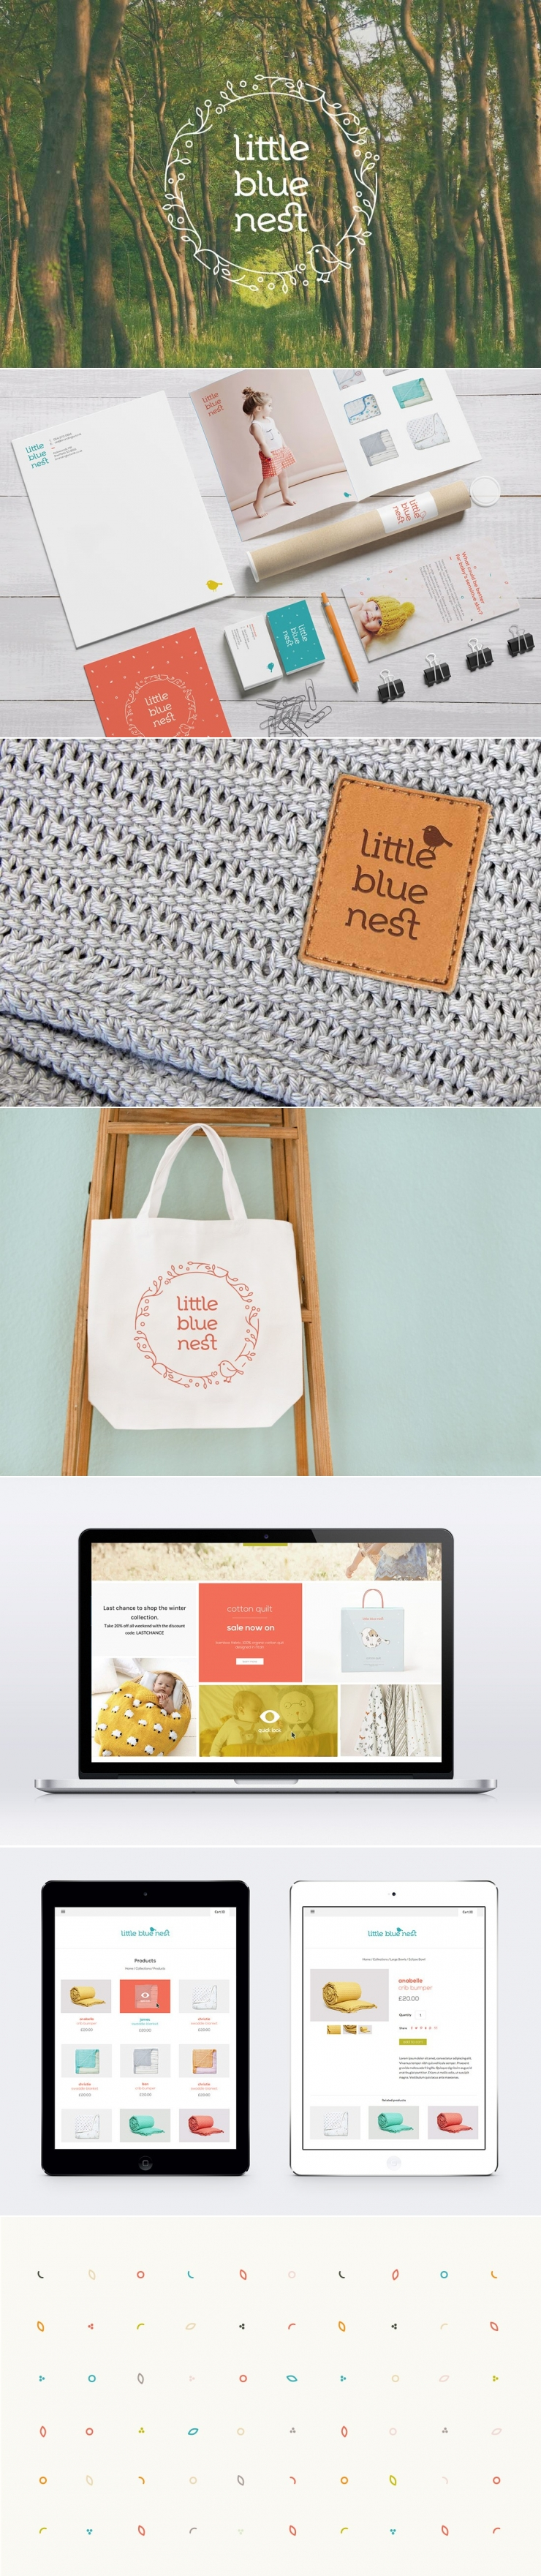 Little Blue Nest | Graphic design agency | Tonik | branding & graphic design for baby fashion brand. - created via https://pinthemall.net